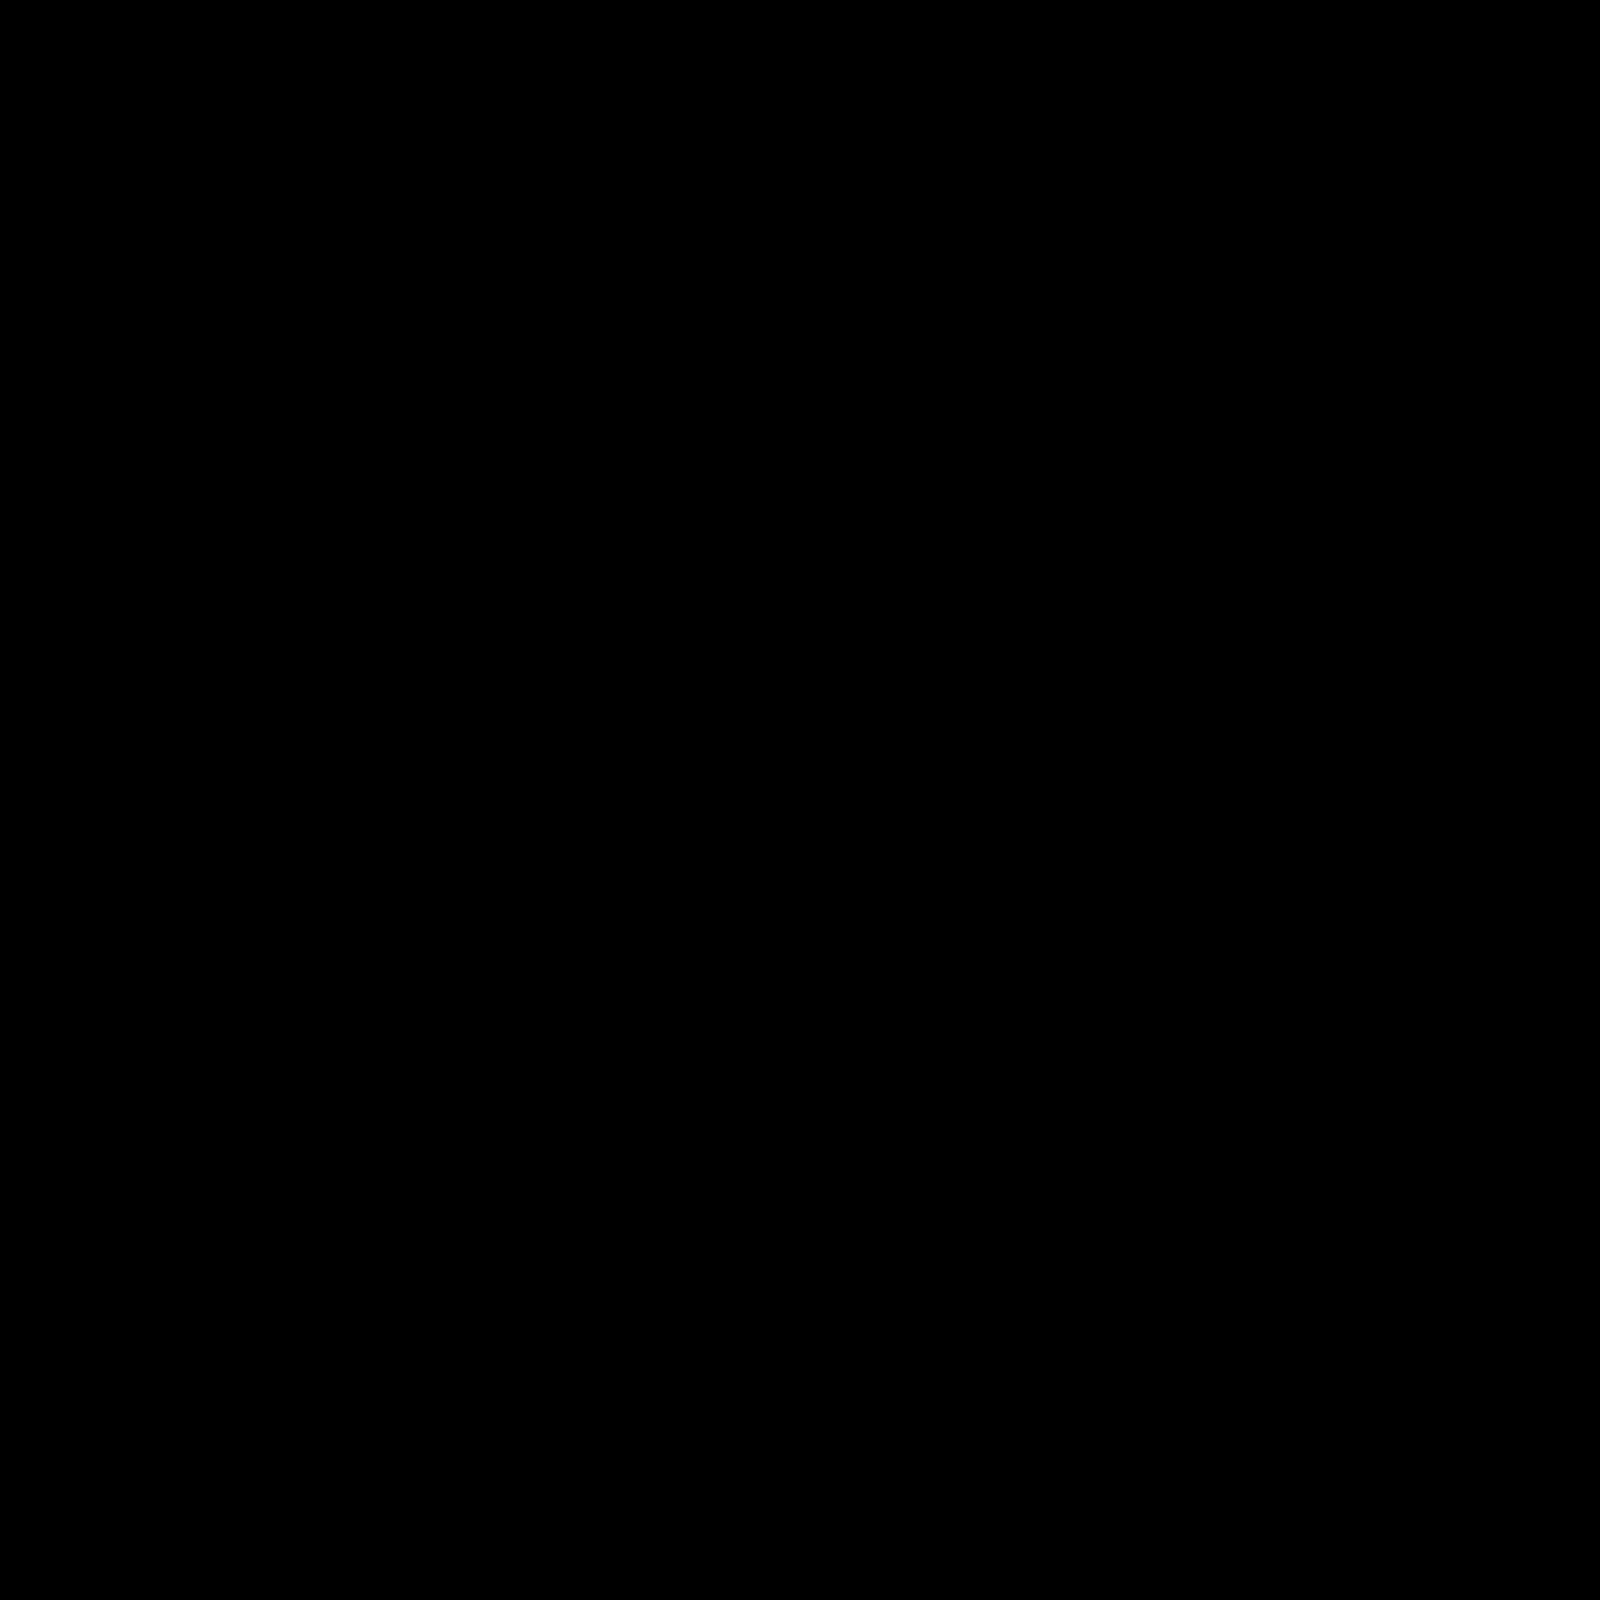 Autobus 2 icon